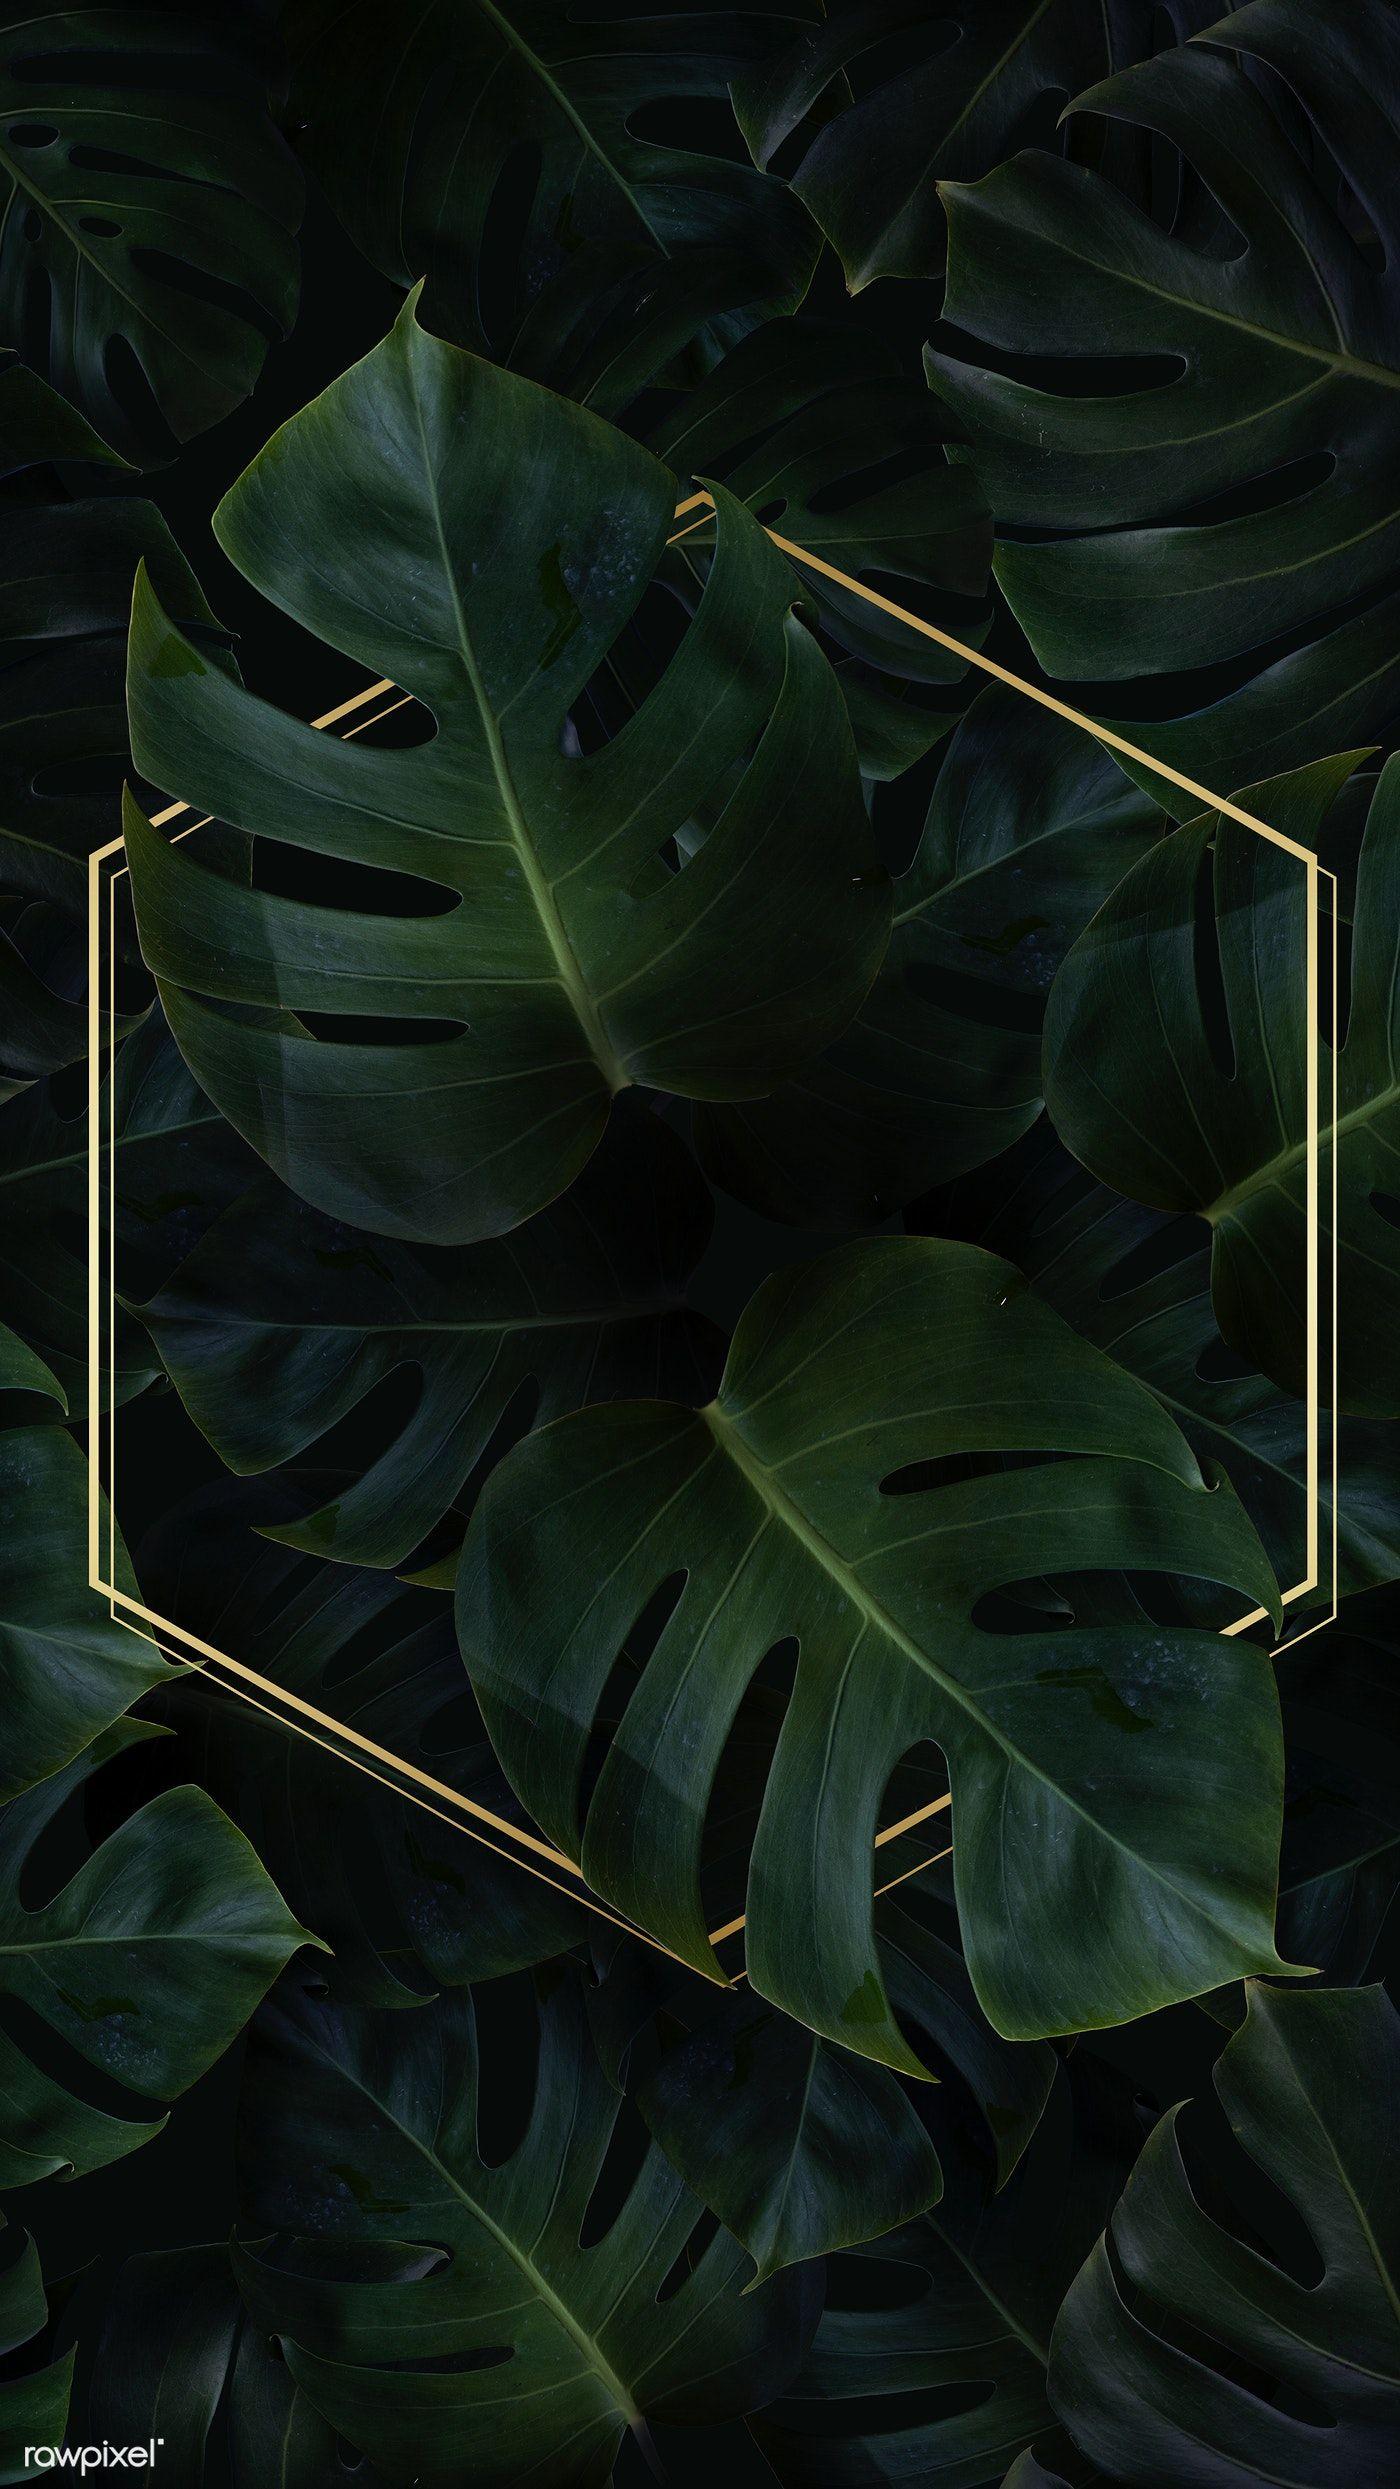 Download Premium Image Of Hexagon Golden Frame On A Tropical Background Tropical Background Backgrounds Phone Wallpapers Framed Wallpaper